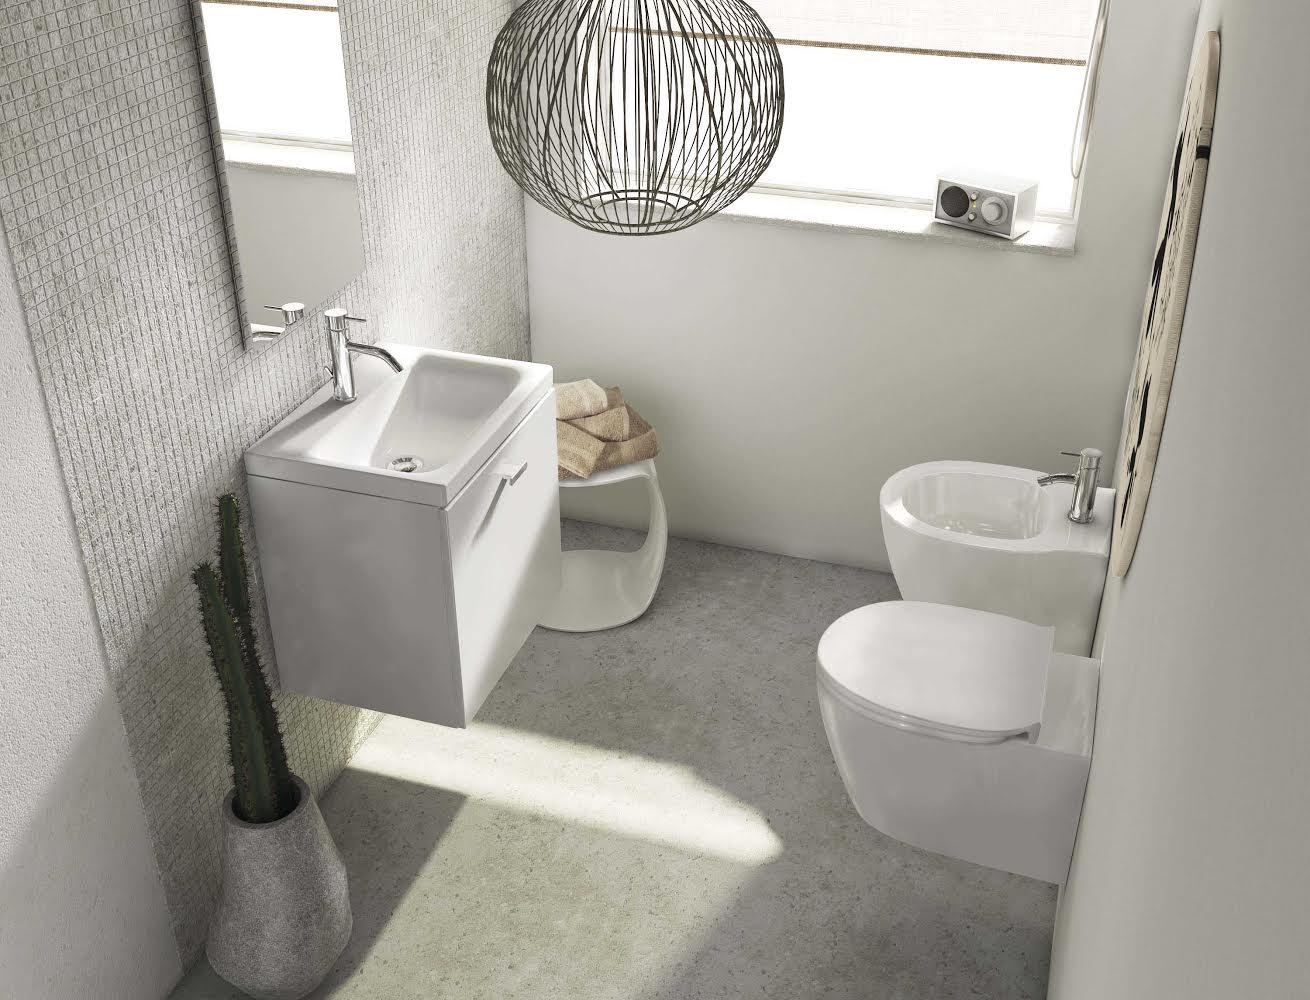 Vasca Da Bagno Dolomite Prezzi : Mobili bagno ideal standard. beautiful ideal standard arredo bagno